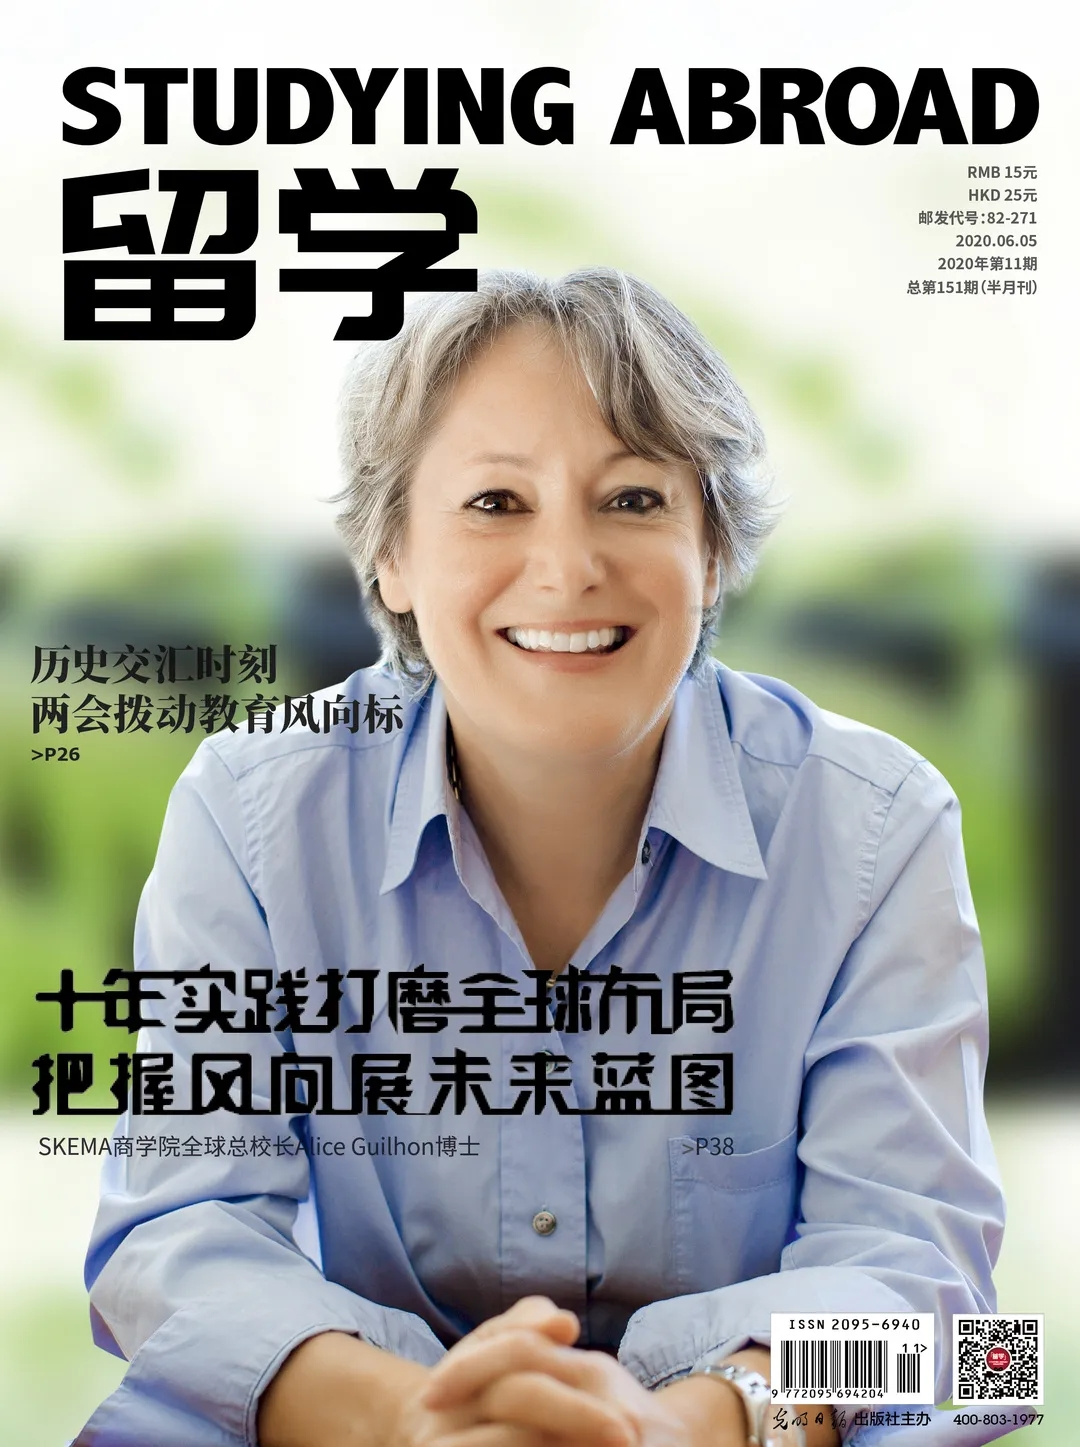 SKEMA商学院全球总校长Alice Guilhon博士接受《留学杂志》专访